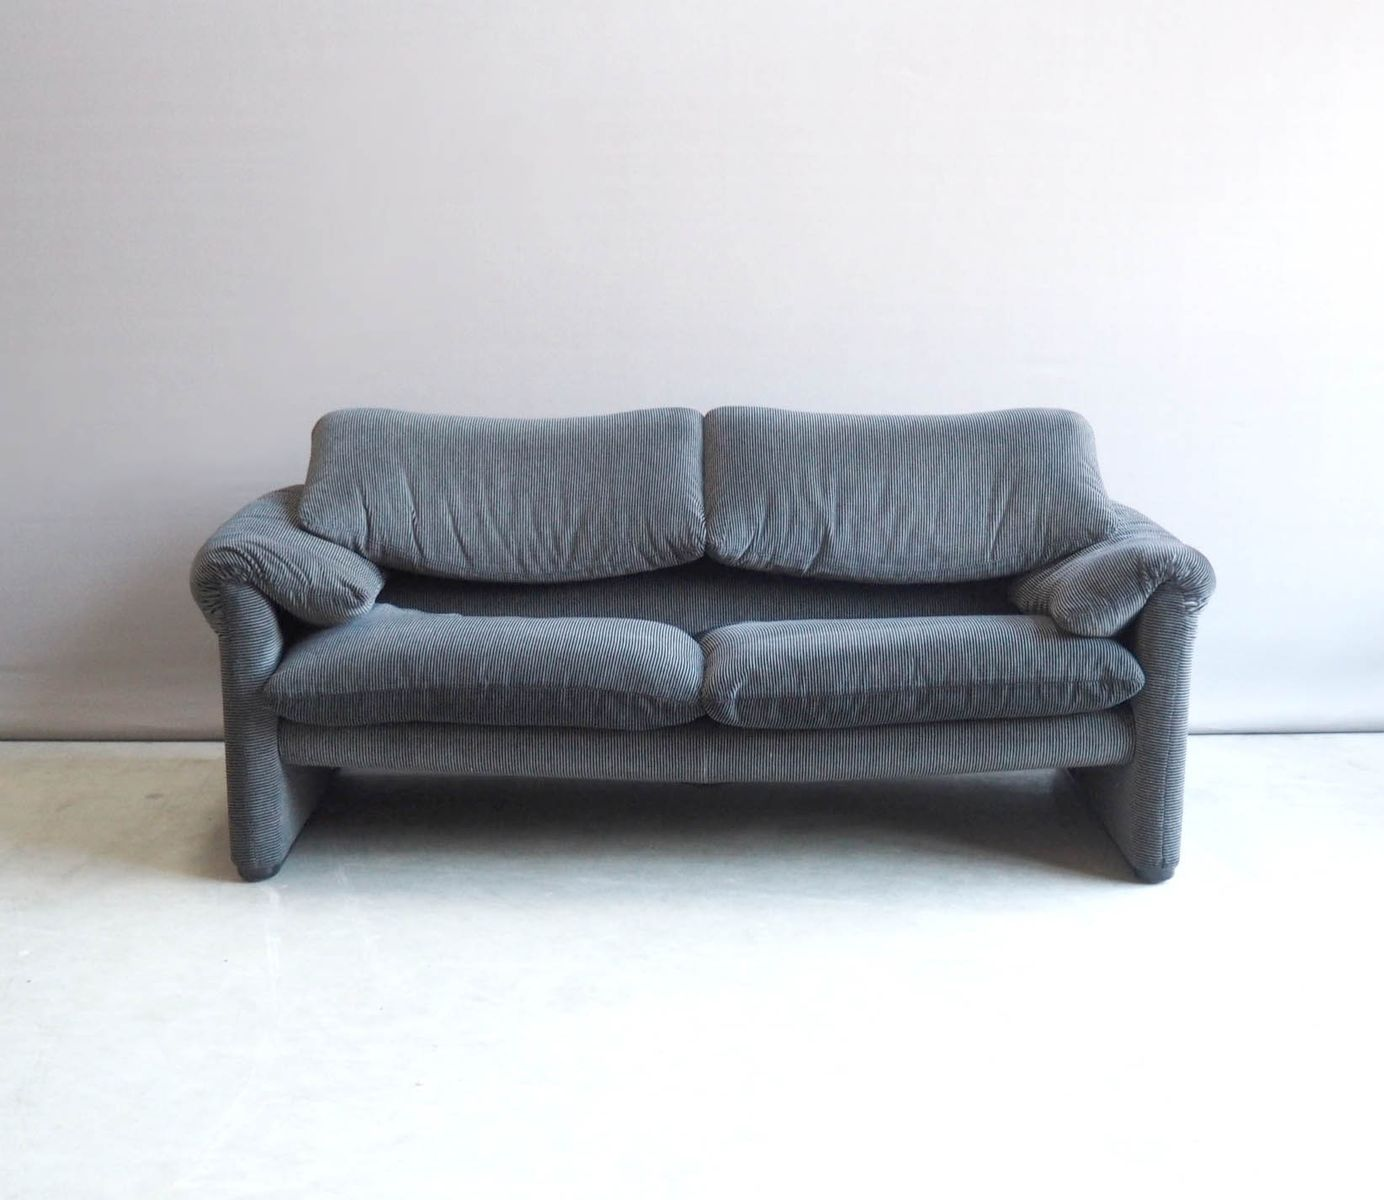 italienisches zwei sitzer maralunga sofa von vico magistretti f r cassina 1980er bei pamono kaufen. Black Bedroom Furniture Sets. Home Design Ideas